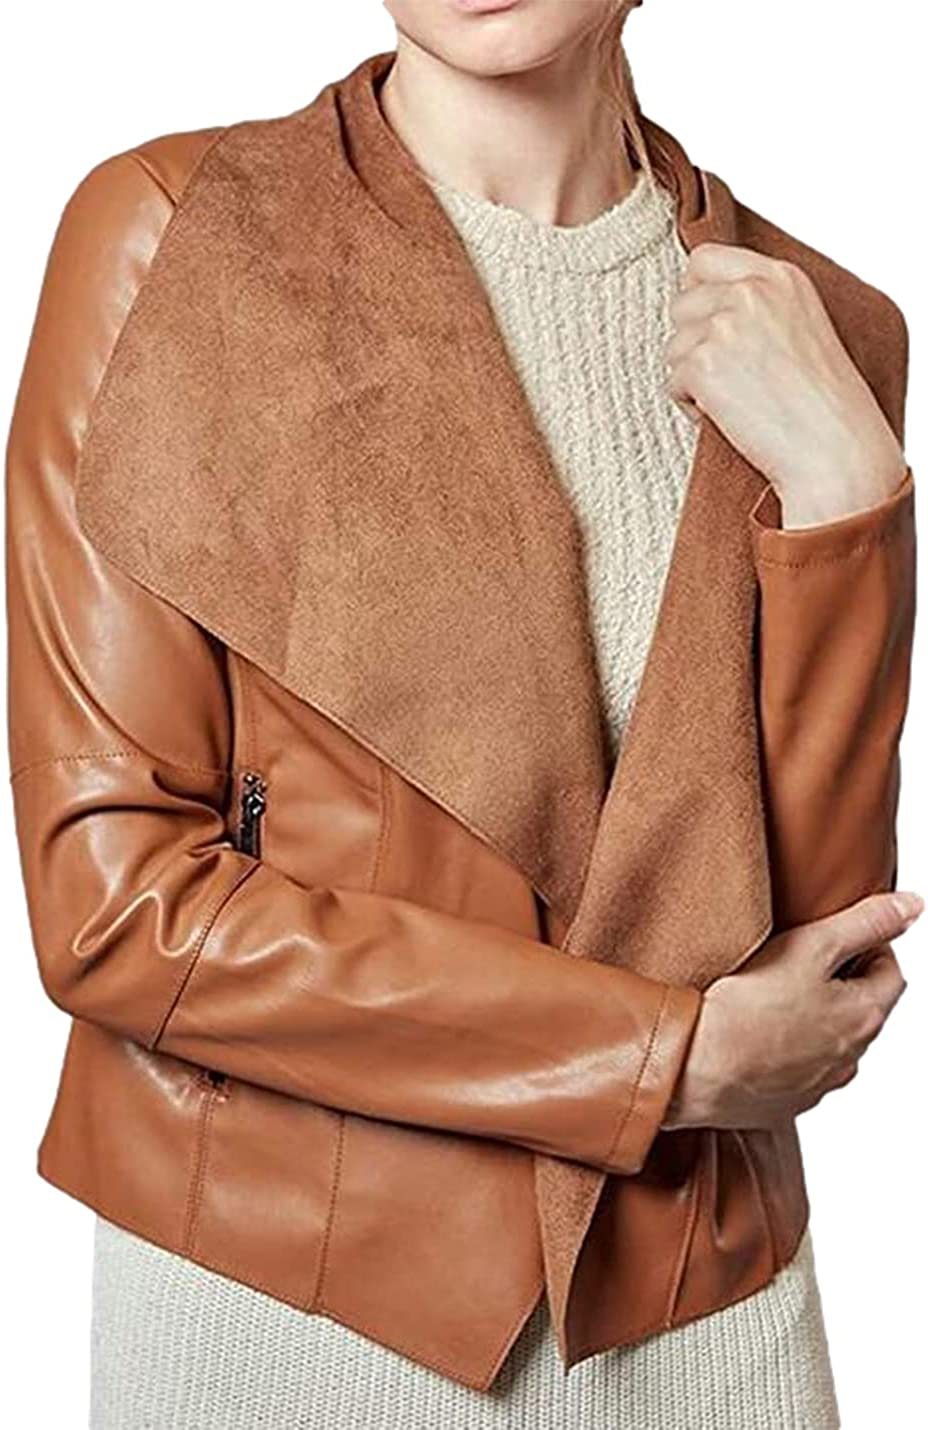 Xishiloft Women's Leather Jackets, Faux Motorcycle Plus Size Moto Biker Coat Short Lightweight PU Lapel Jacket